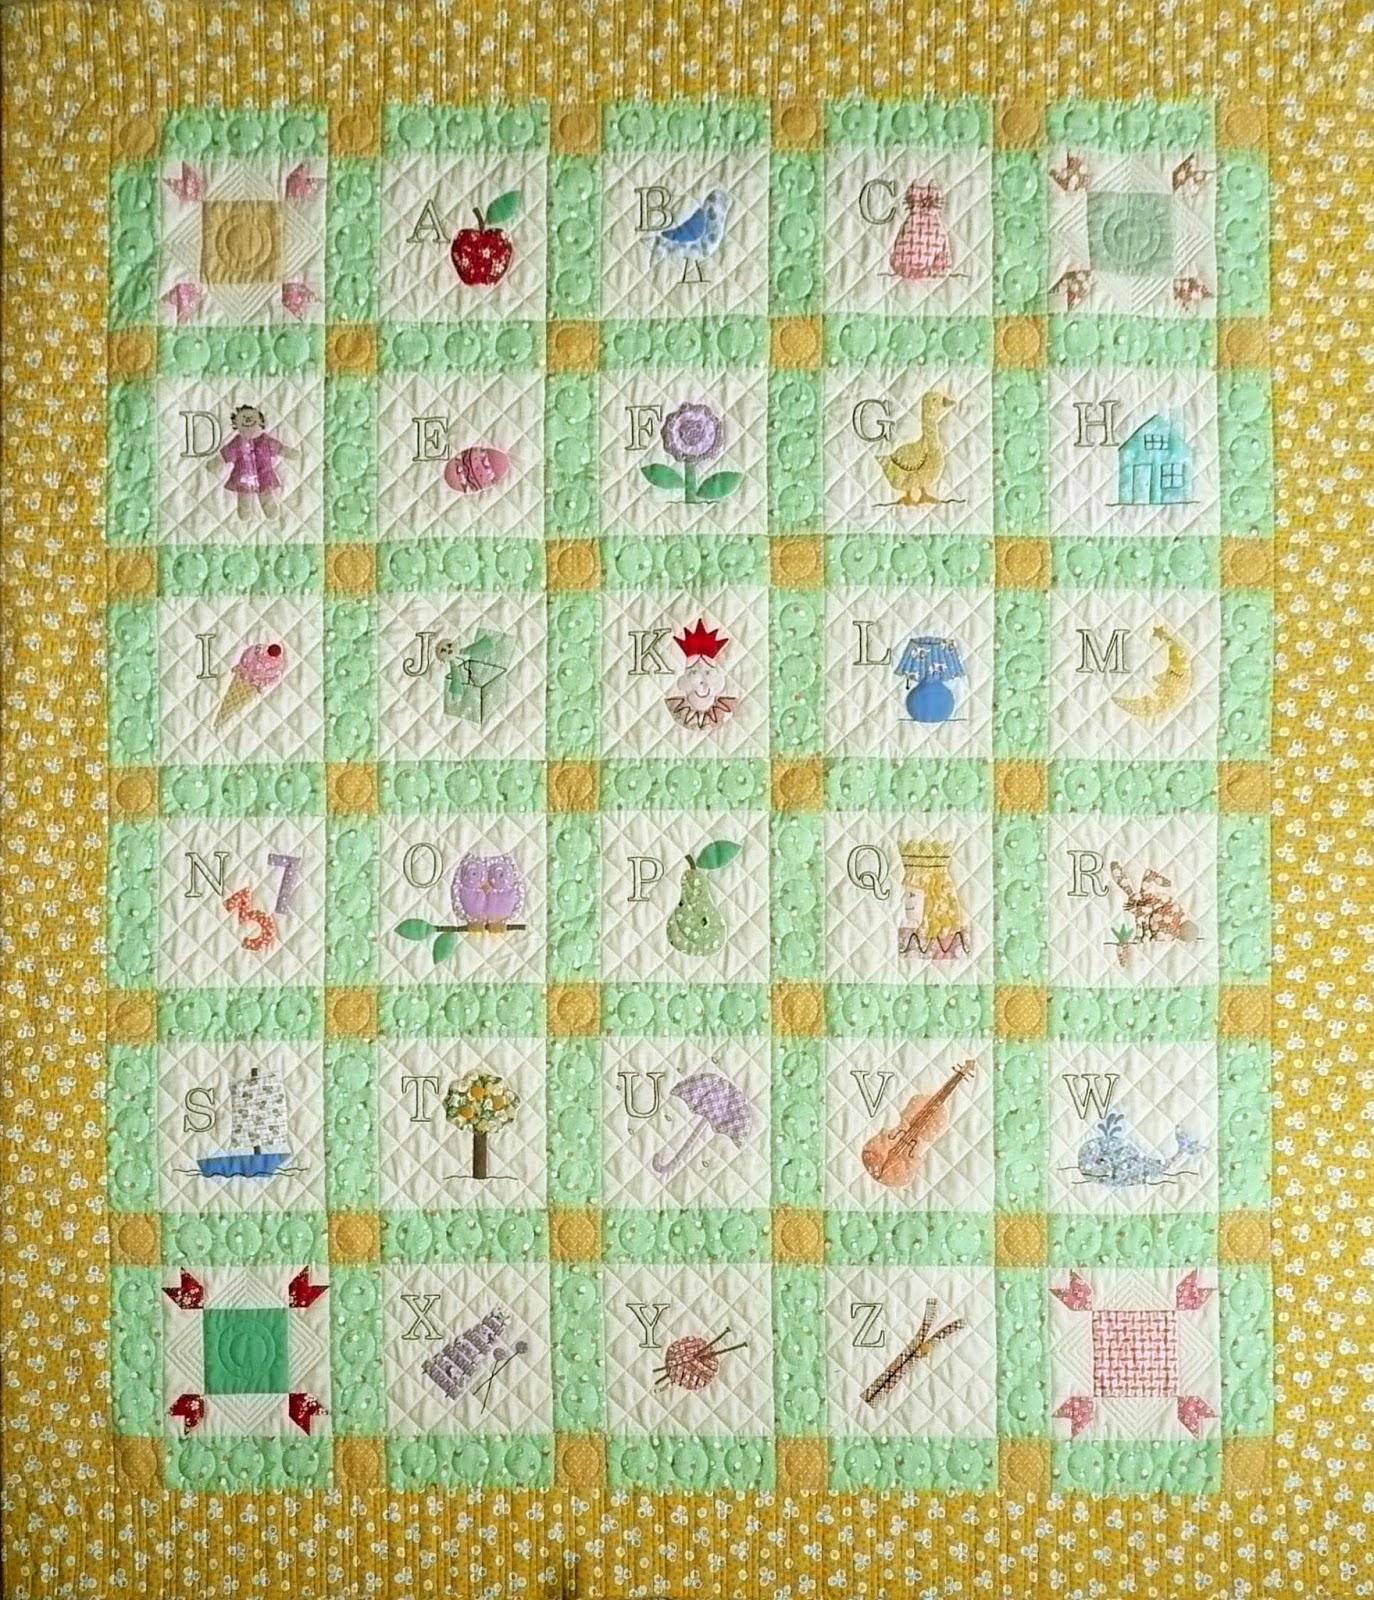 Alphabet Templates For Quilting : Come Quilt (Sue Garman): October 2013